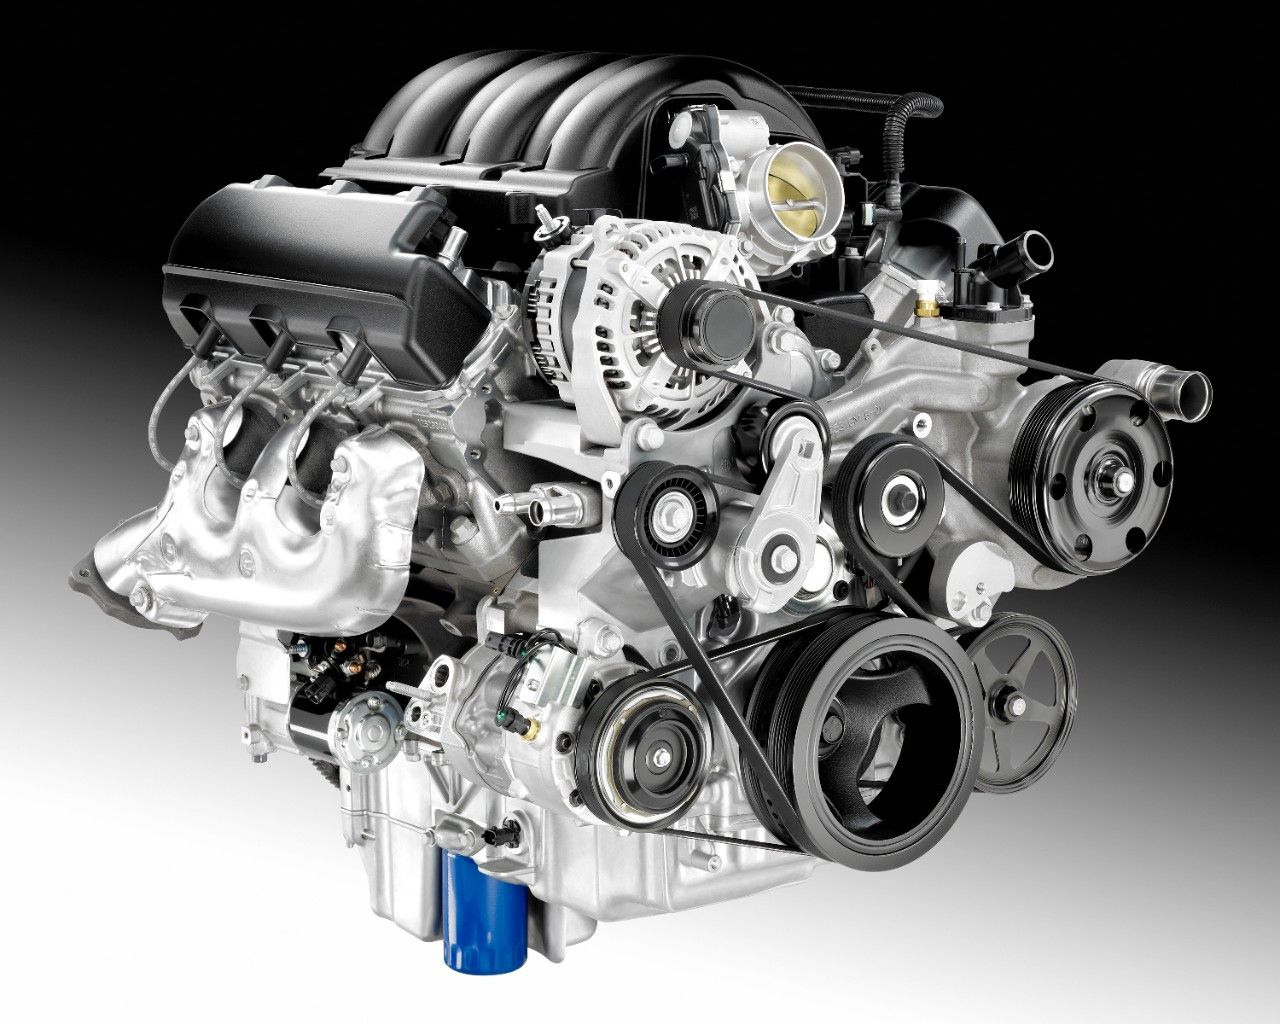 Gm shelves vortec engine family name introduces ecotec3 family in new chevrolet silverado